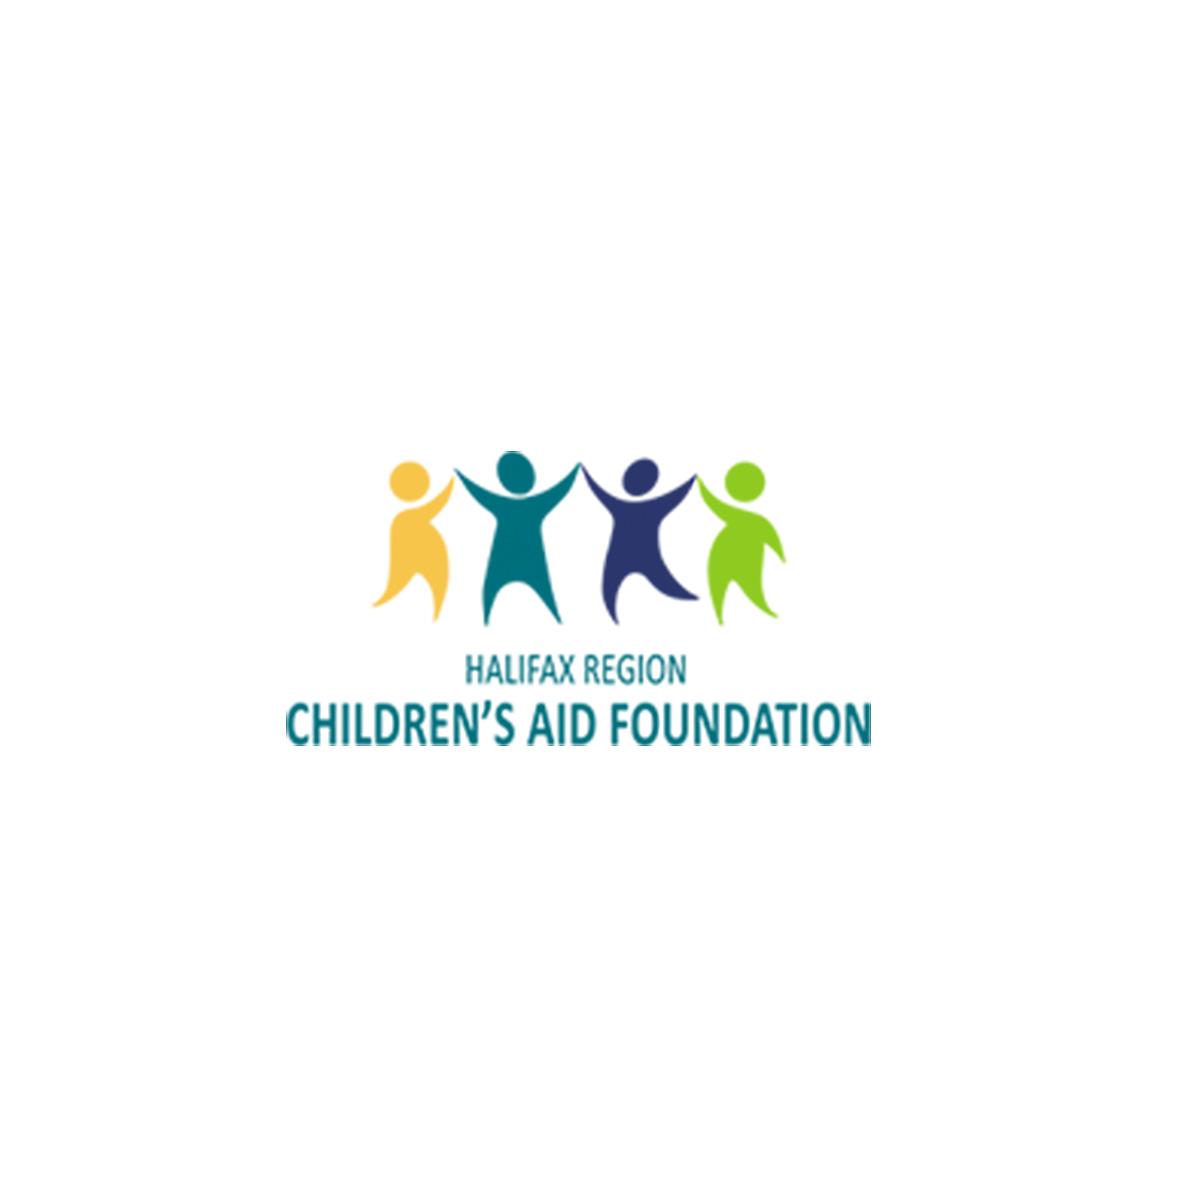 Featured Organization - Image